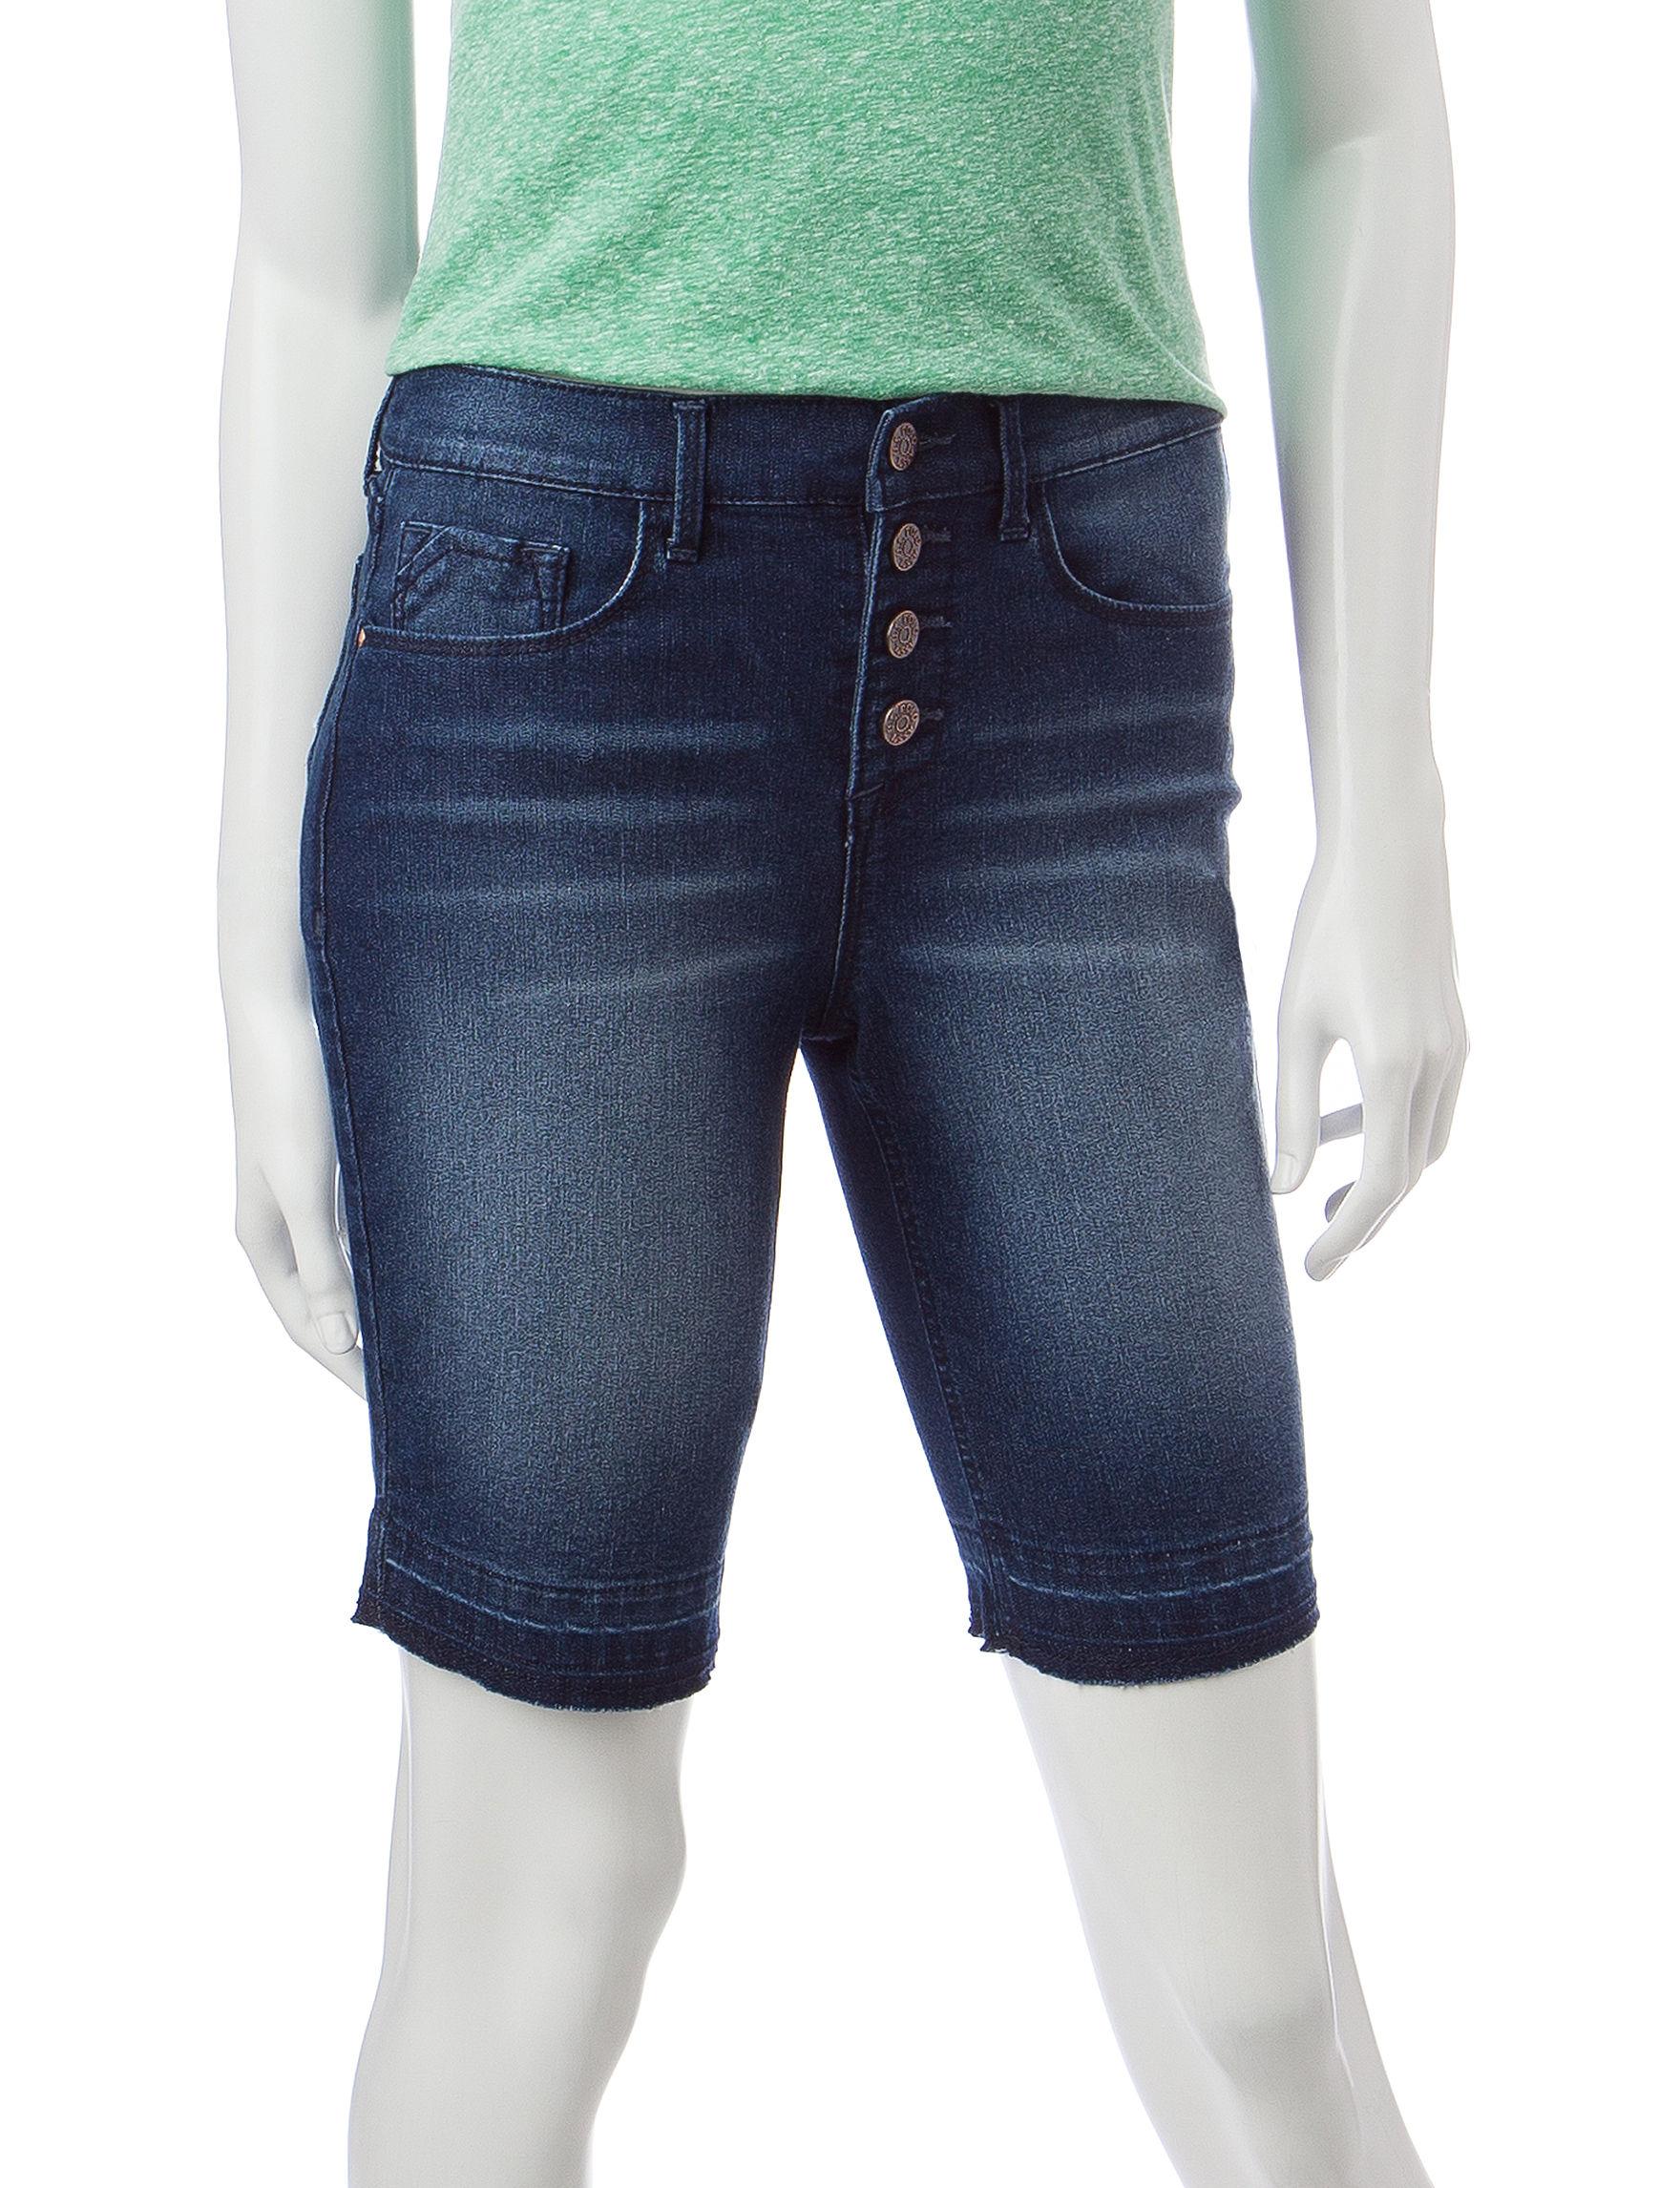 U.S. Polo Assn. Blue Denim Shorts